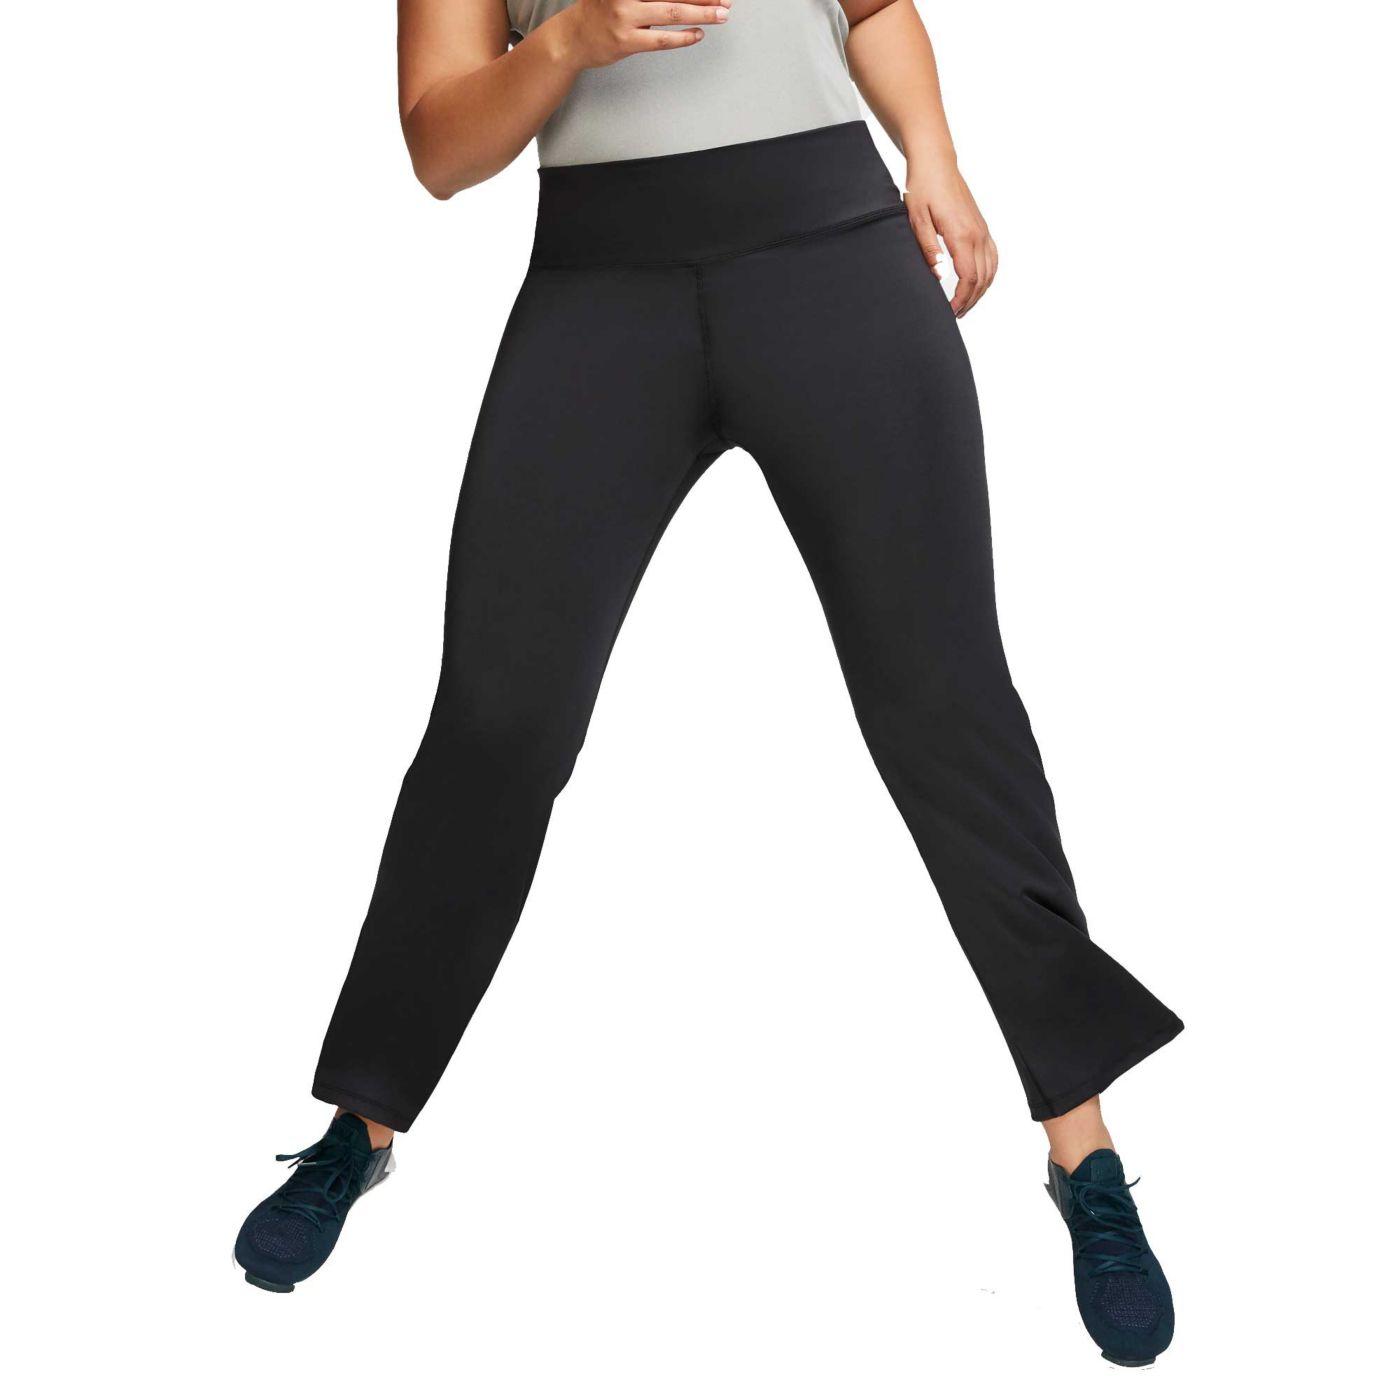 Nike Women's Plus Size Power Training Pants